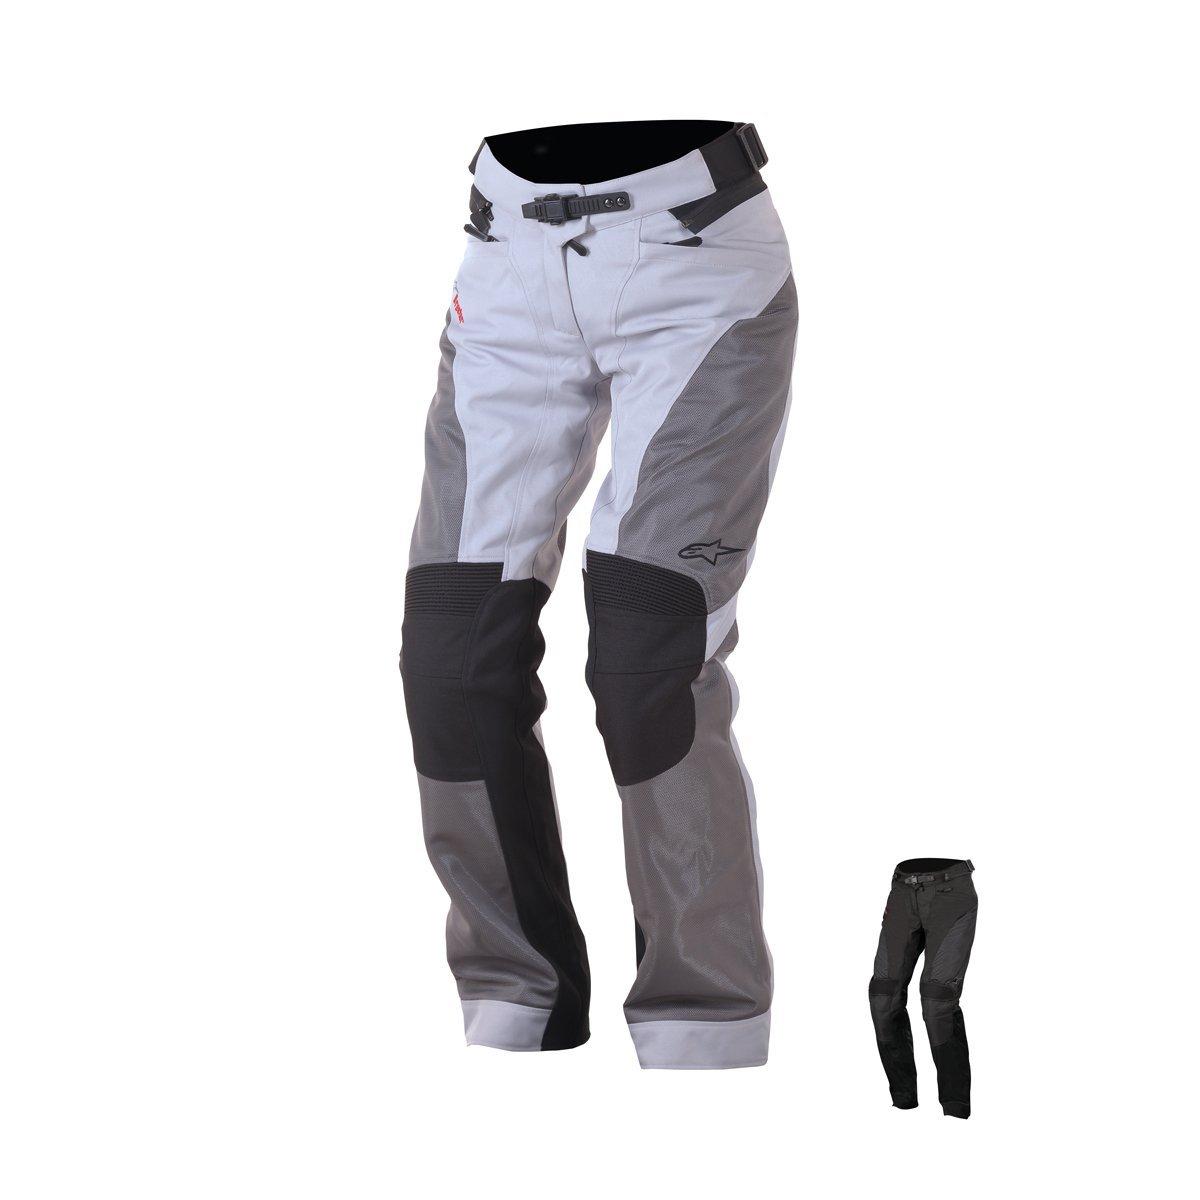 Alpinestars Sonoran Women's Sports Bike Motorcycle Pants - Black / Size X-Large